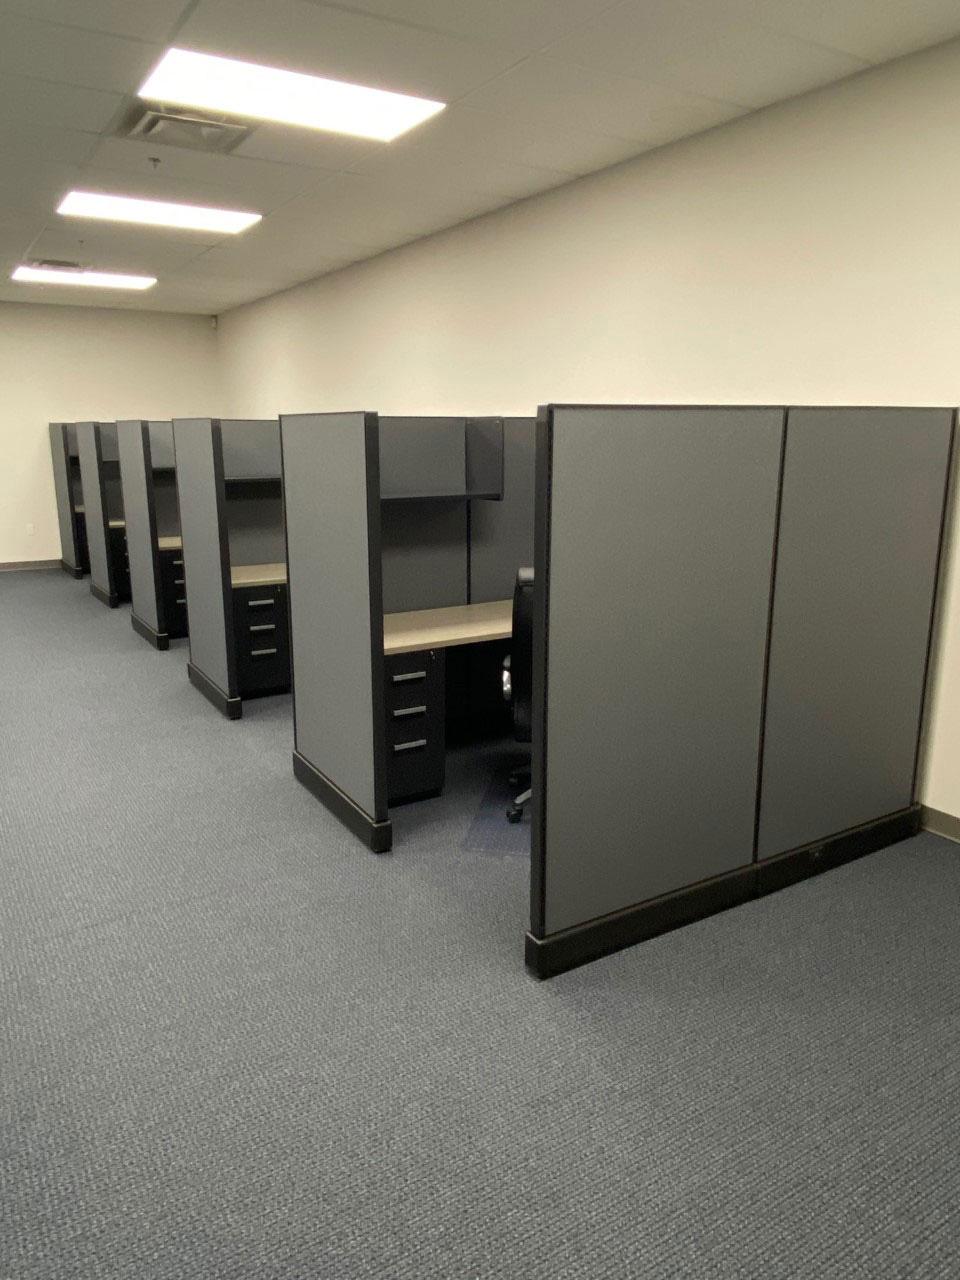 office-cubicle-furniture-suppliers-in-bradenton-florida-9.jpg